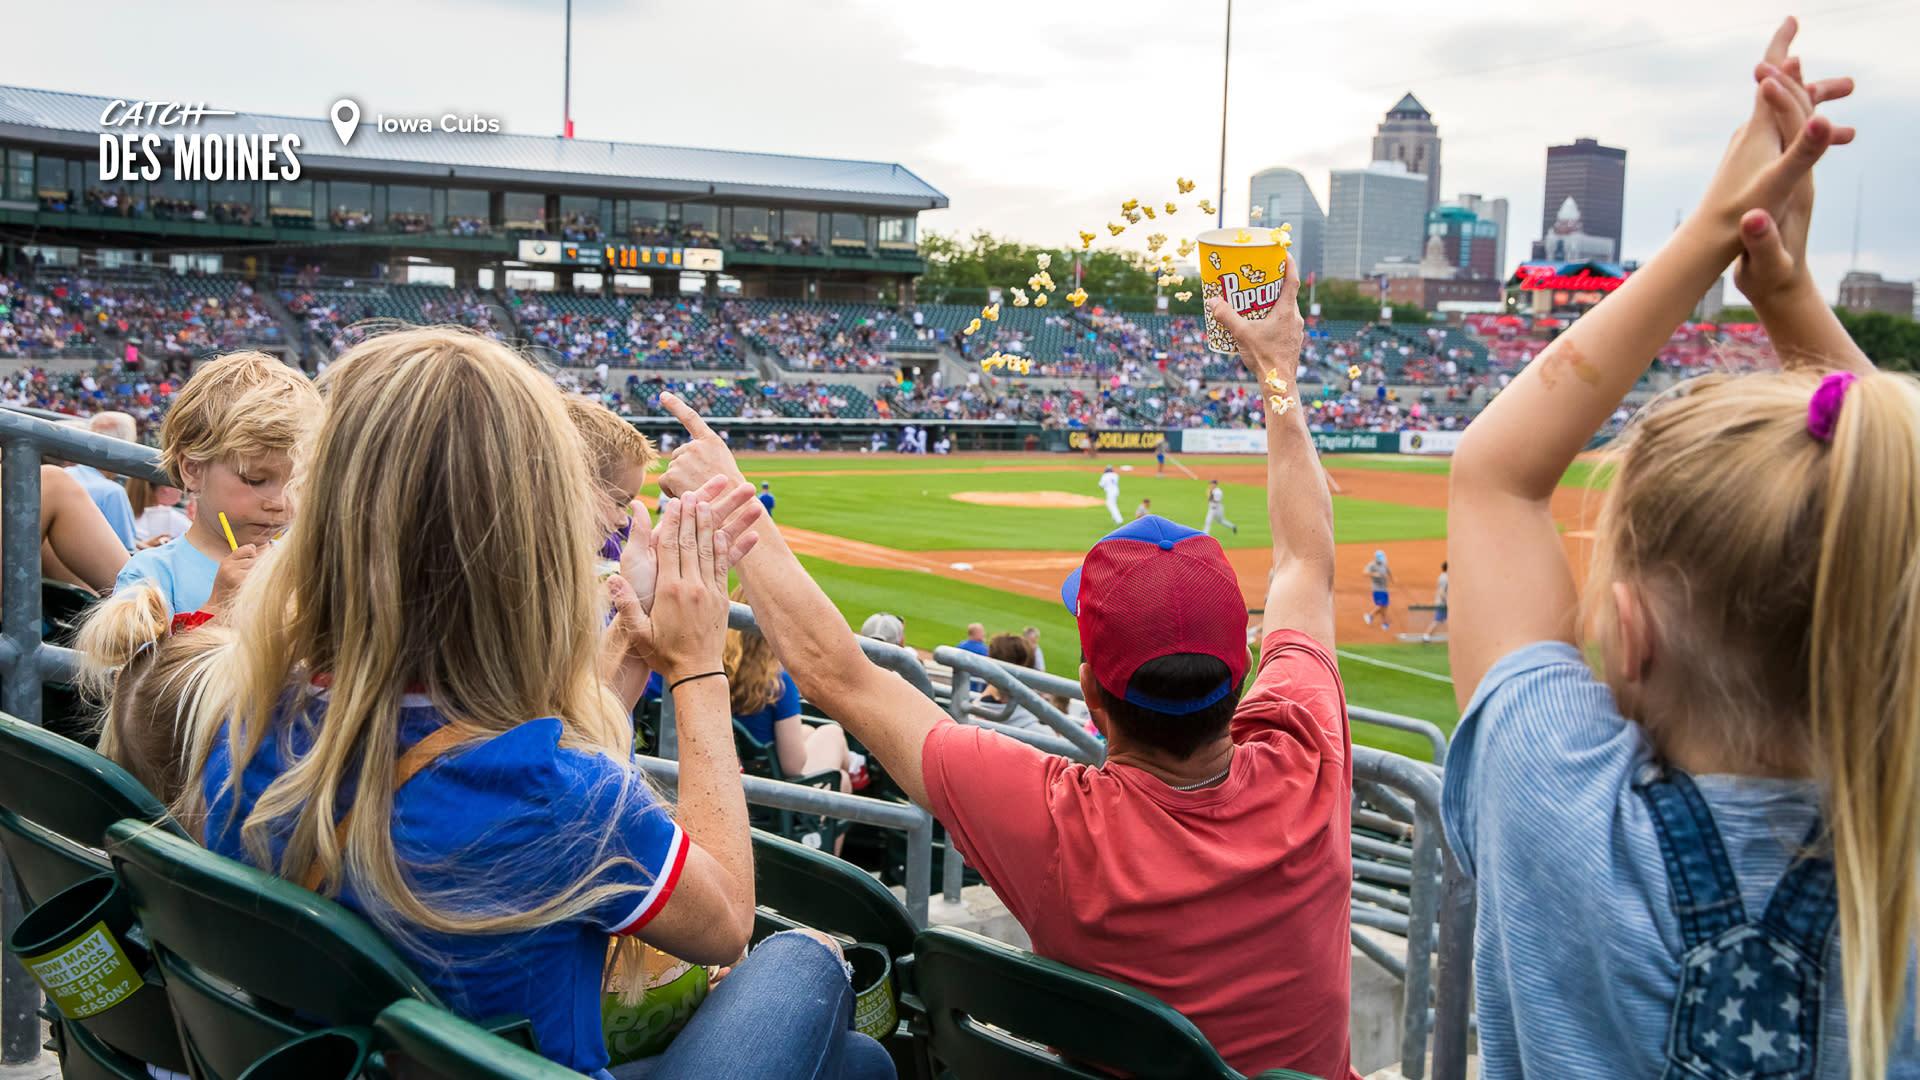 Iowa Cubs Spectators and Stadium Zoom Background